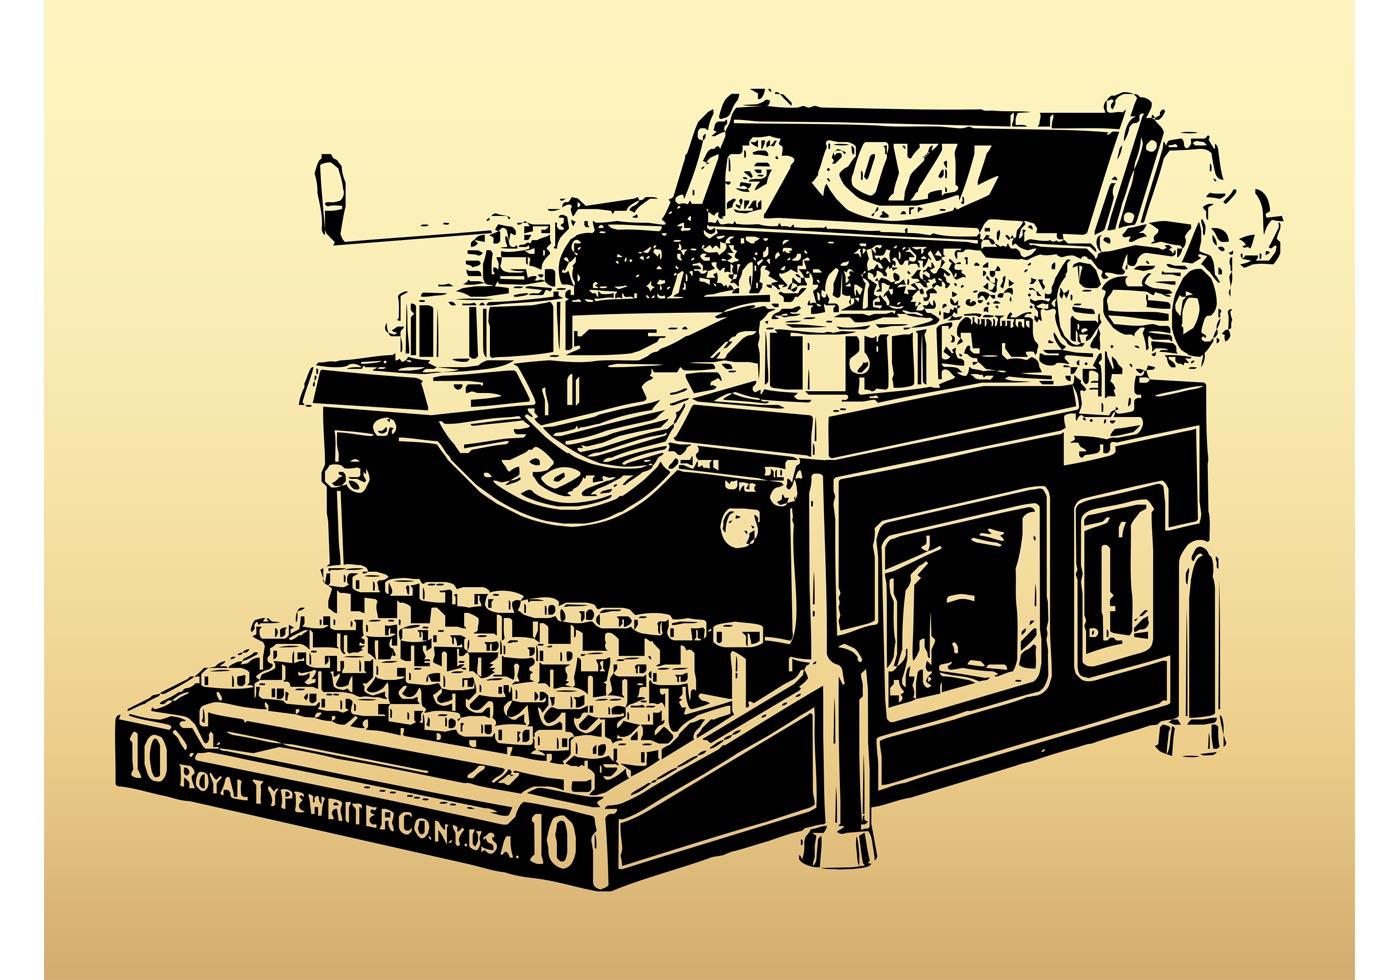 royal typewriter download free vector art stock graphics images. Black Bedroom Furniture Sets. Home Design Ideas